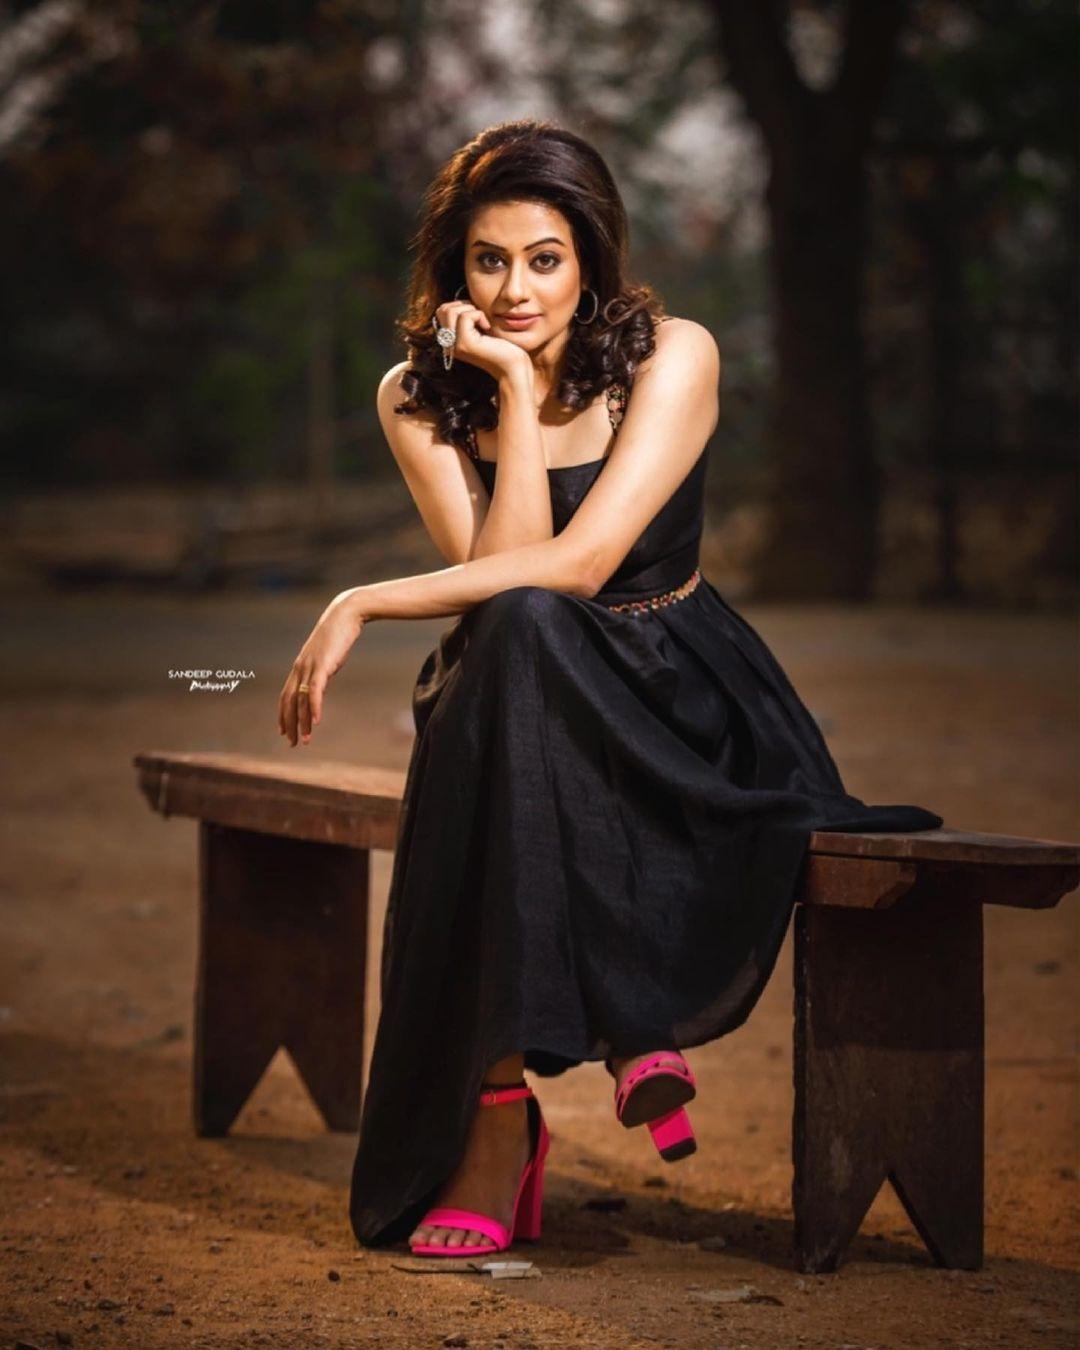 Priyamani raj in a custom made black dress my mehak shetty for dhee kings-4